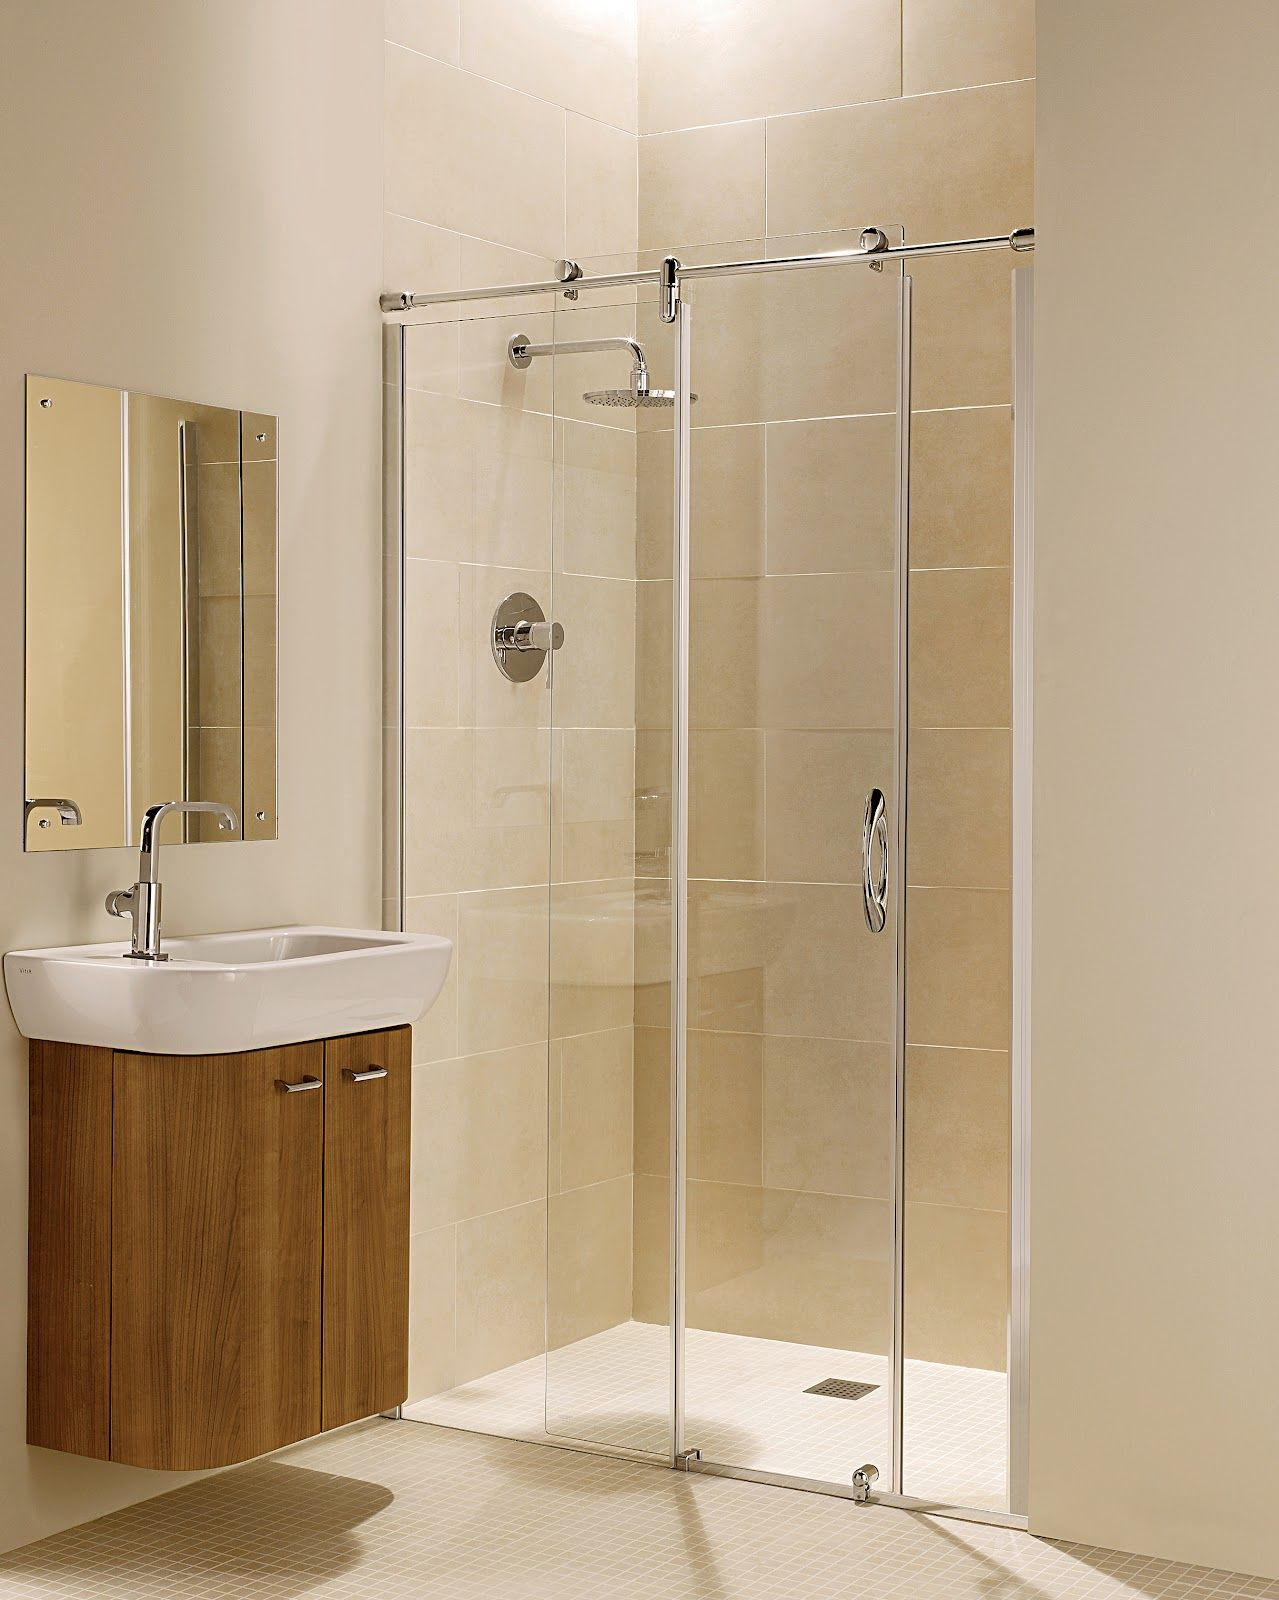 Frameless Shower Designs Can Also Be Fitted Onto Our Range Of Designer Slimline Shower Trays Bathroom Shower Doors Shower Doors Sliding Shower Door